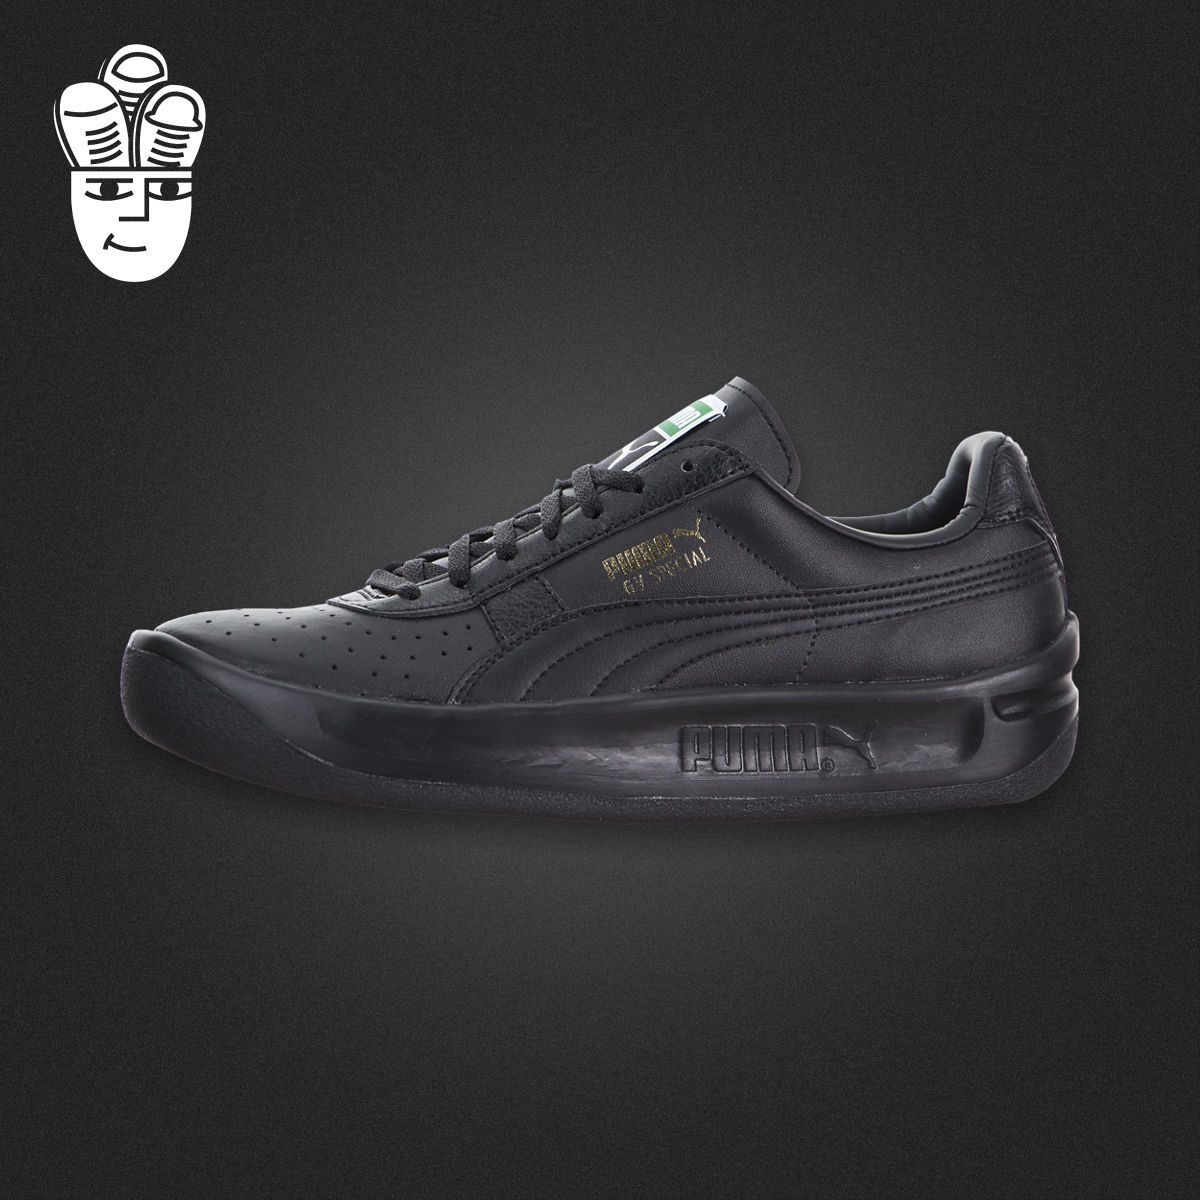 Puma GV Special Jr 彪馬男鞋女鞋 GS 時尚板鞋 運動休閒鞋